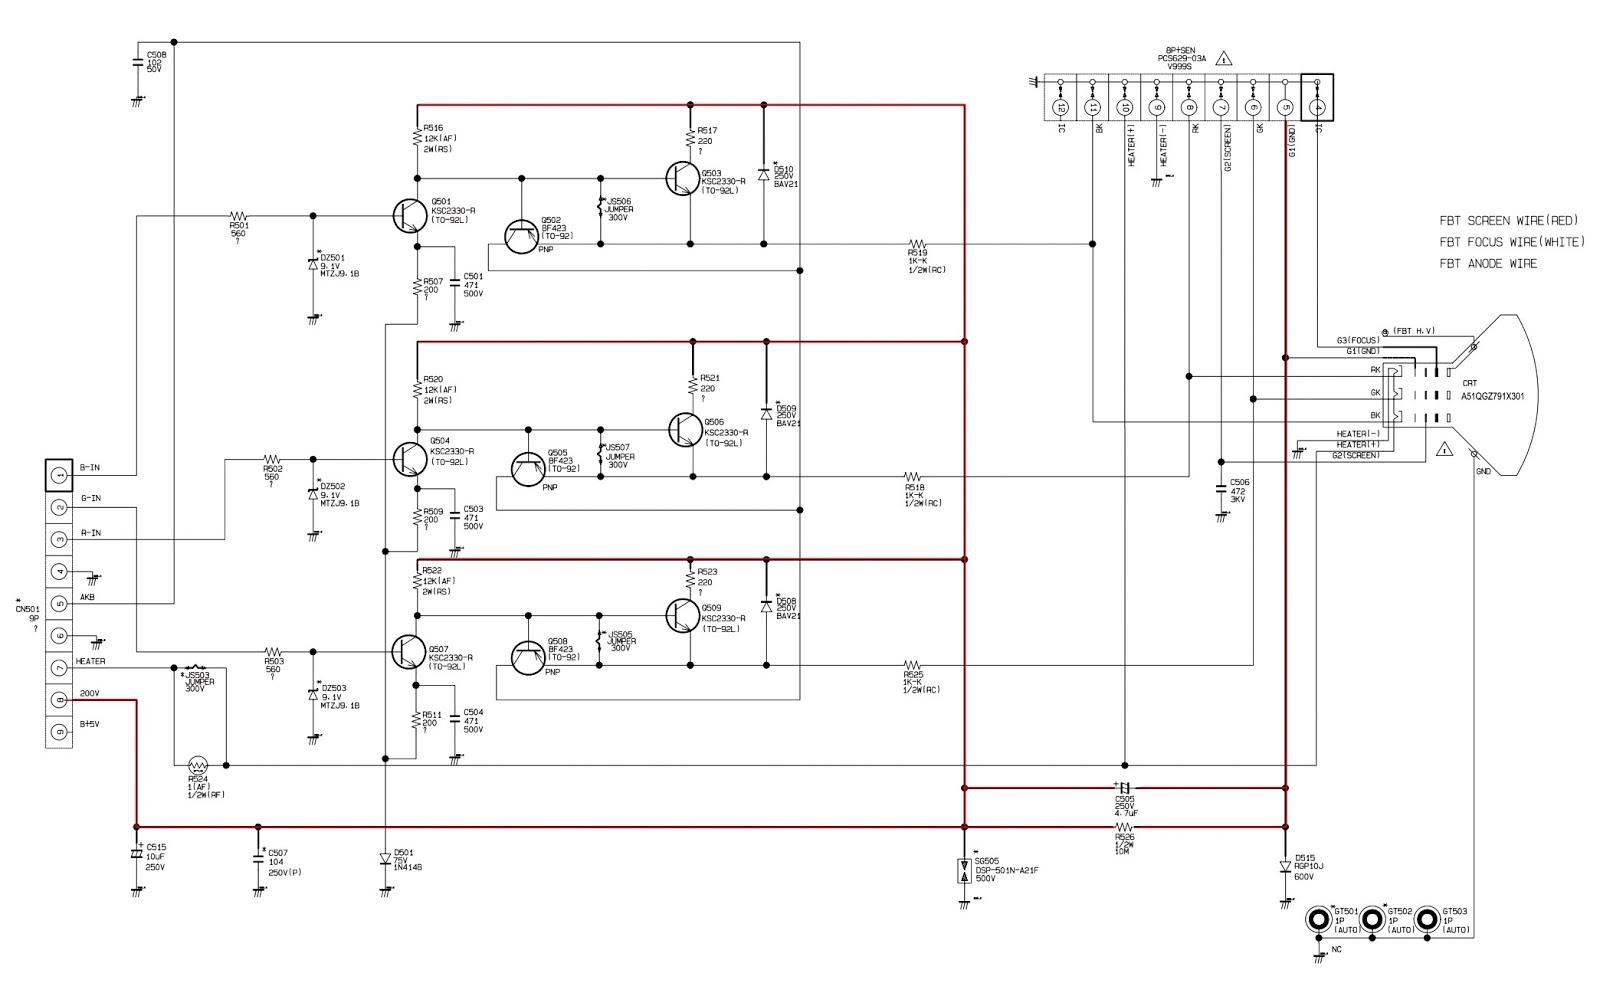 akira lct30kxstp lcd tv power supply circuit diagram schematic rh 207 246 81 240